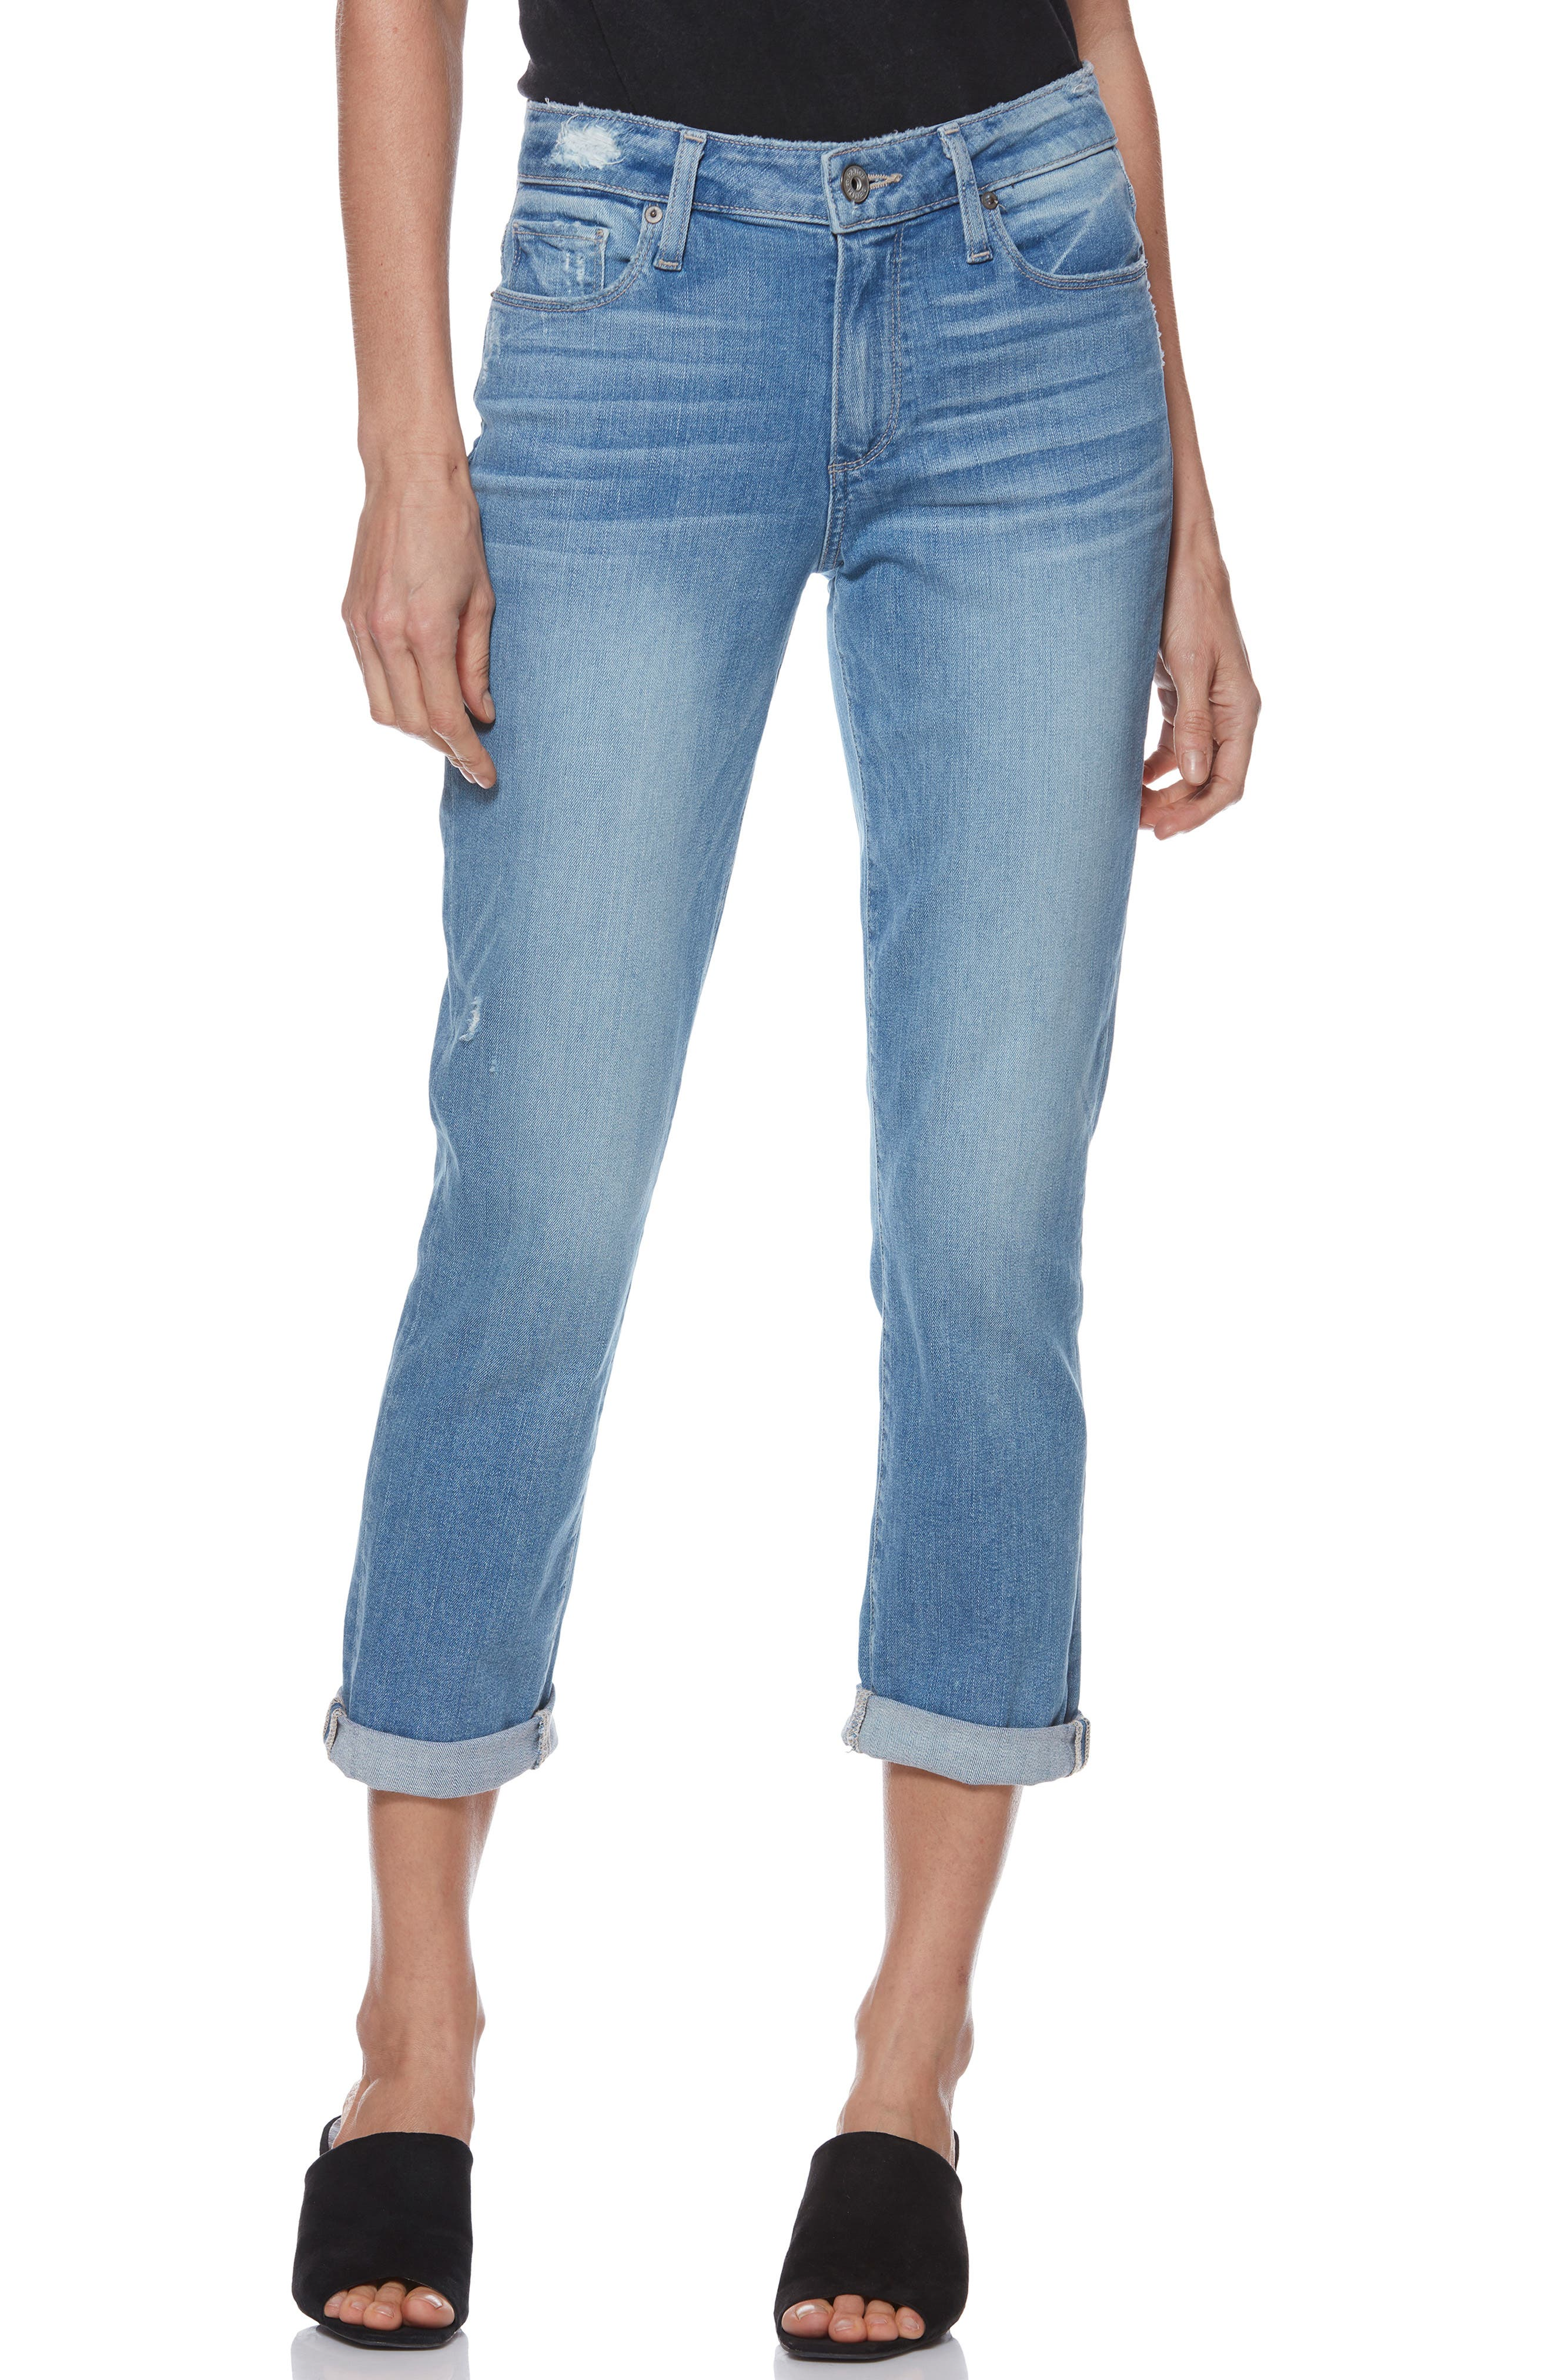 Transcend Vintage - Jimmy Jimmy High Waist Crop Boyfriend Jeans,                         Main,                         color, ATTERBURY